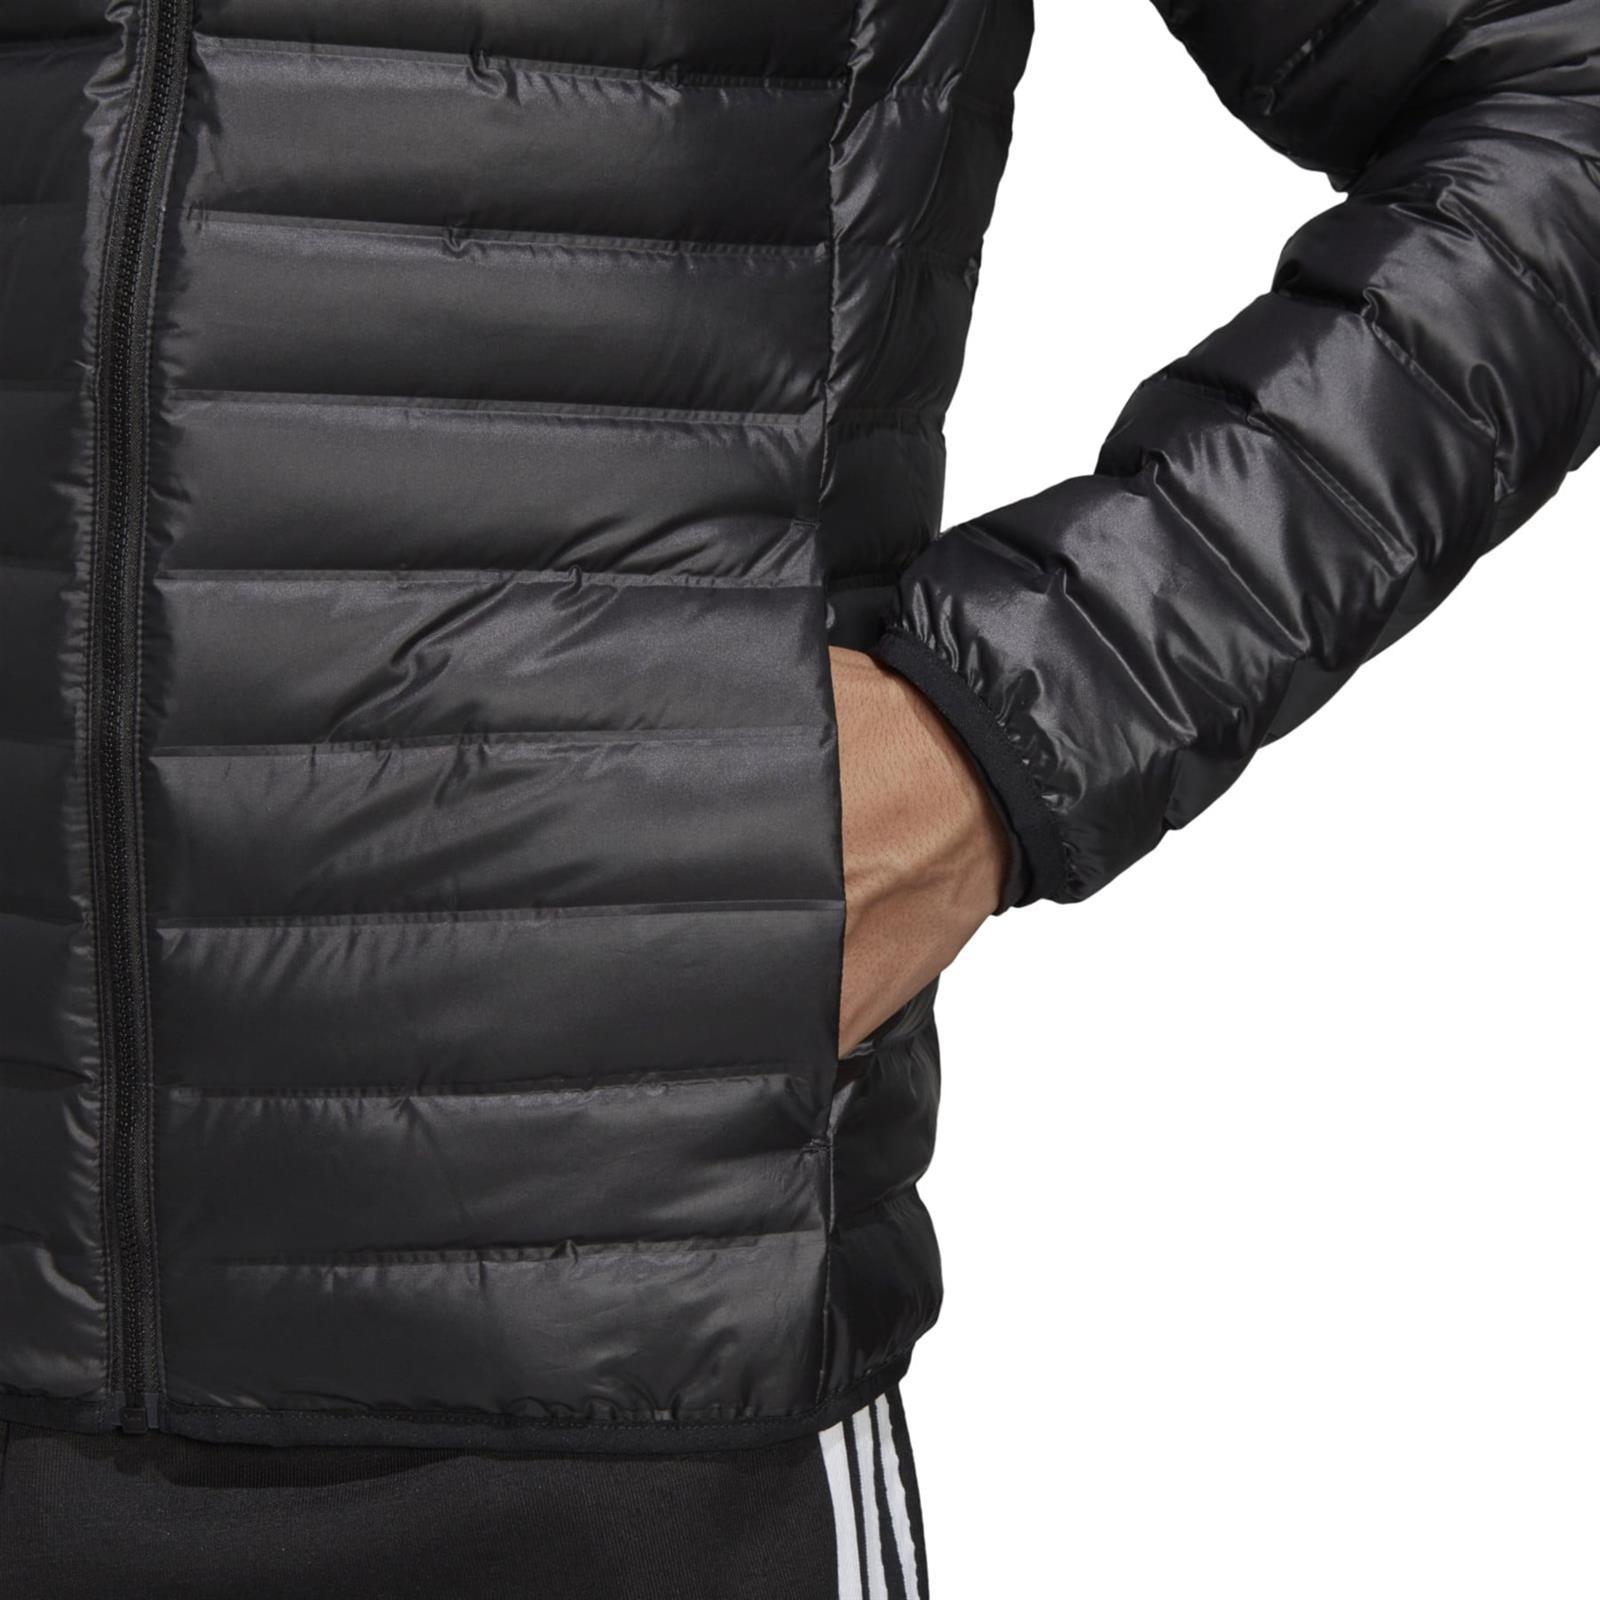 compartir Queja Para exponer  Kurtka adidas Varilite Down Jacket BS1588 - Sportroom.pl